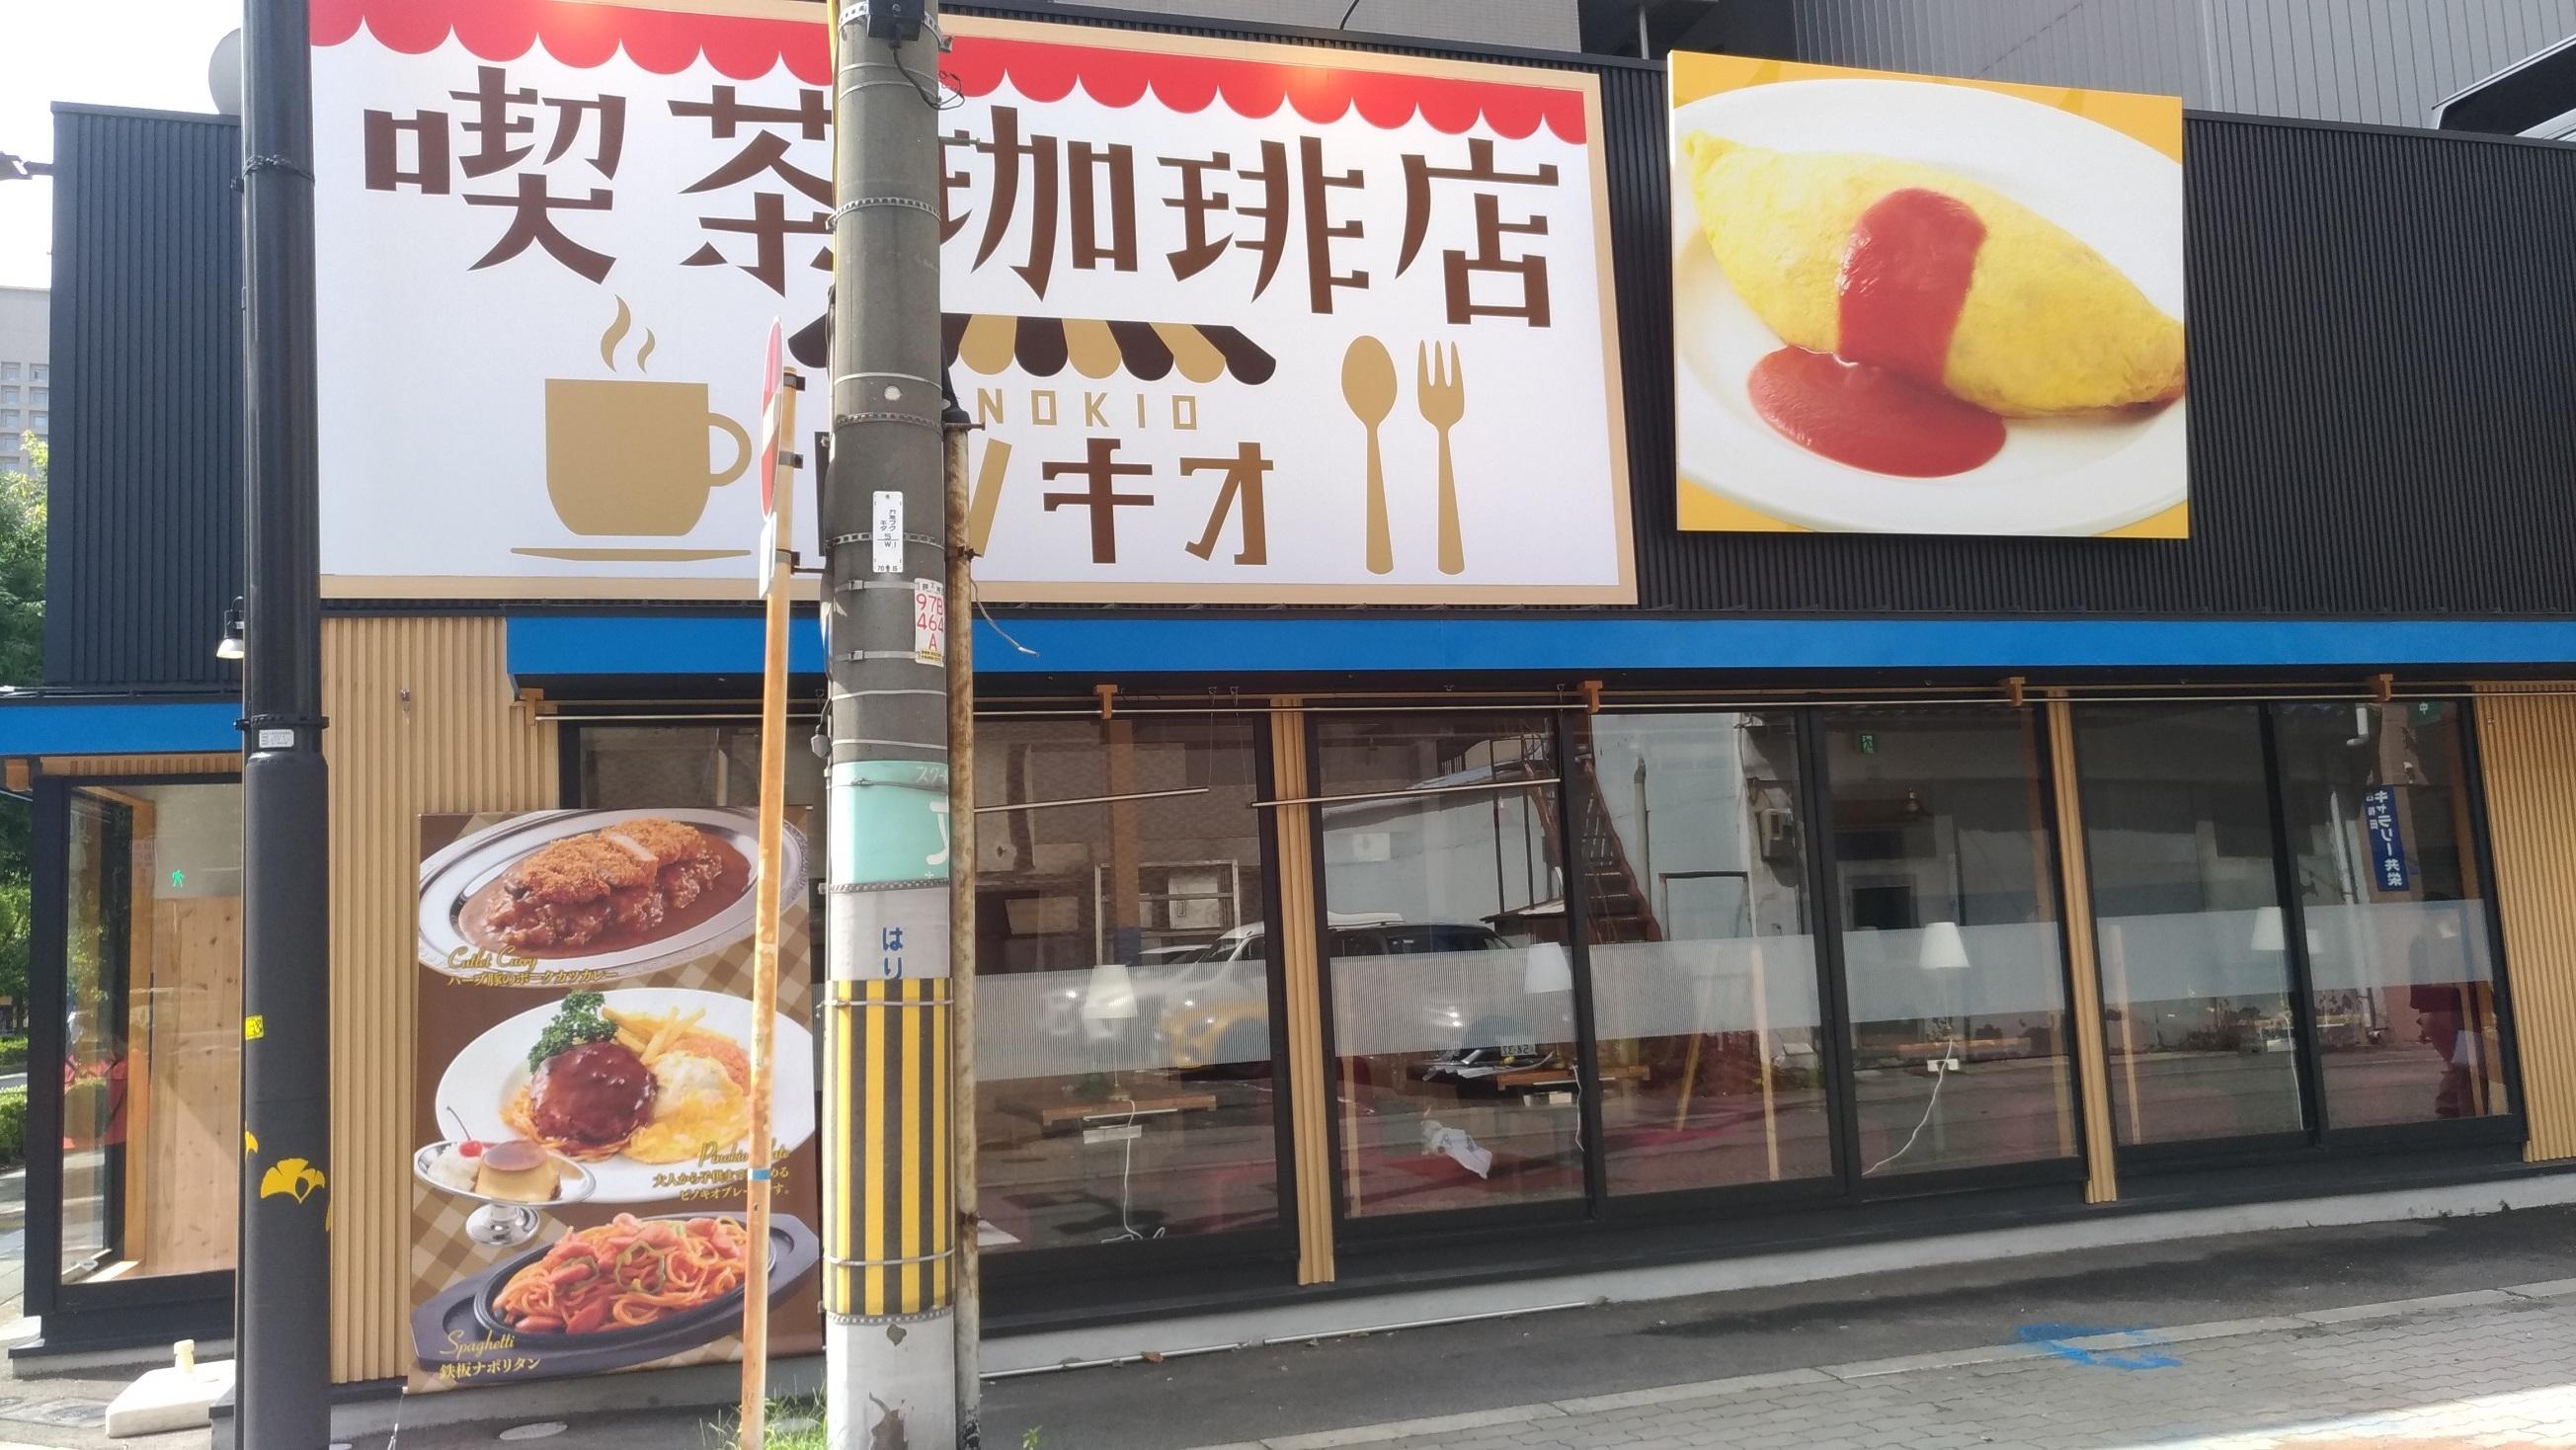 osaka_pinokio_fukushima_3.jpg